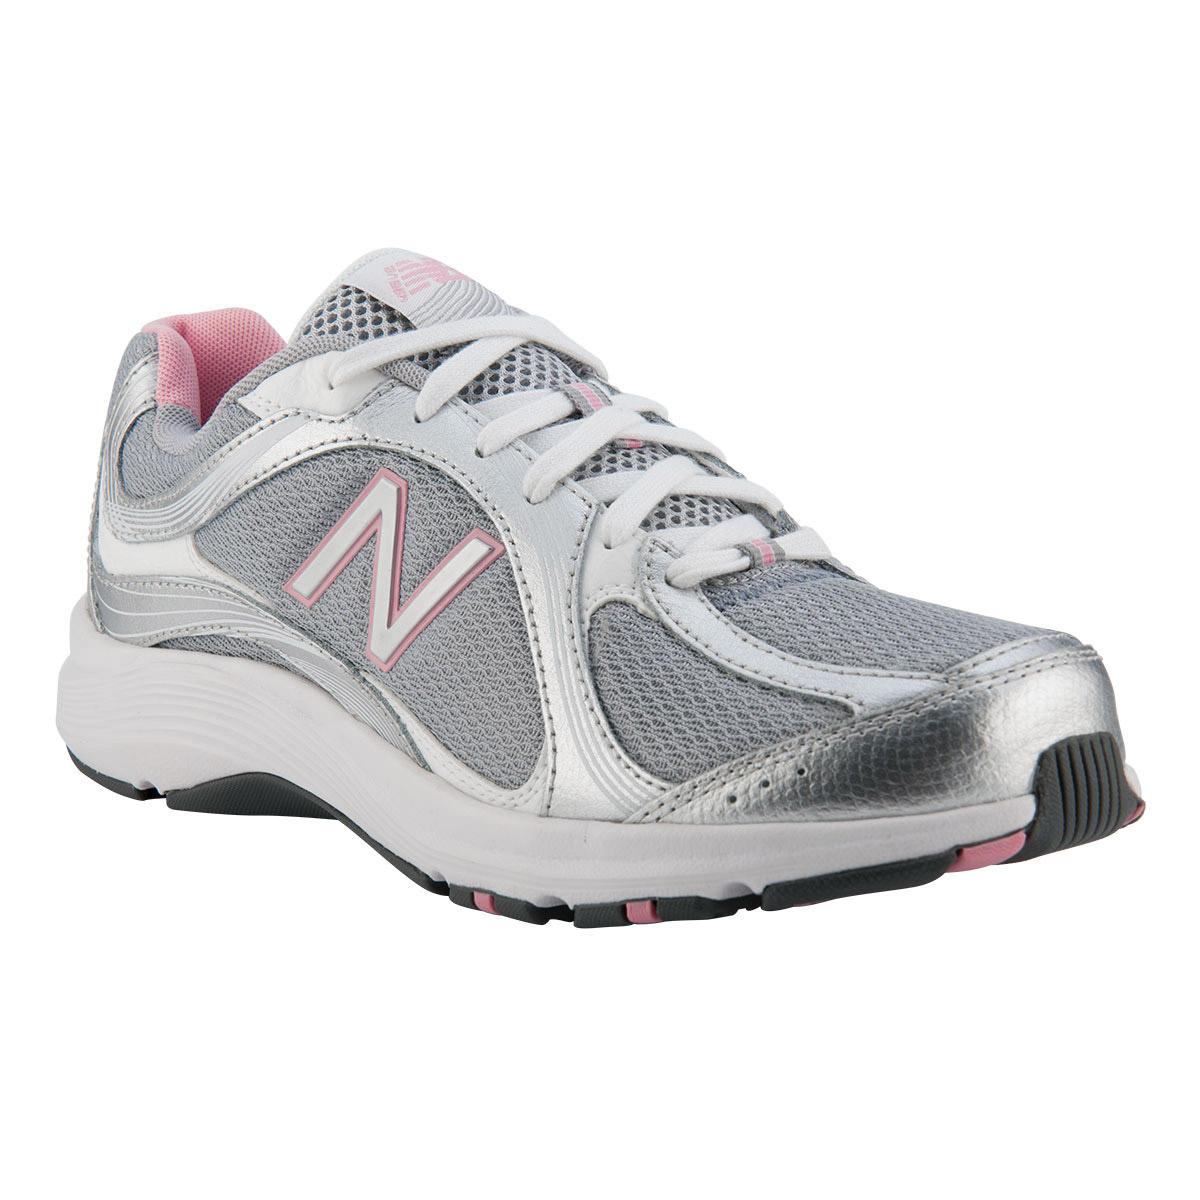 496 Shoes, Wide Width